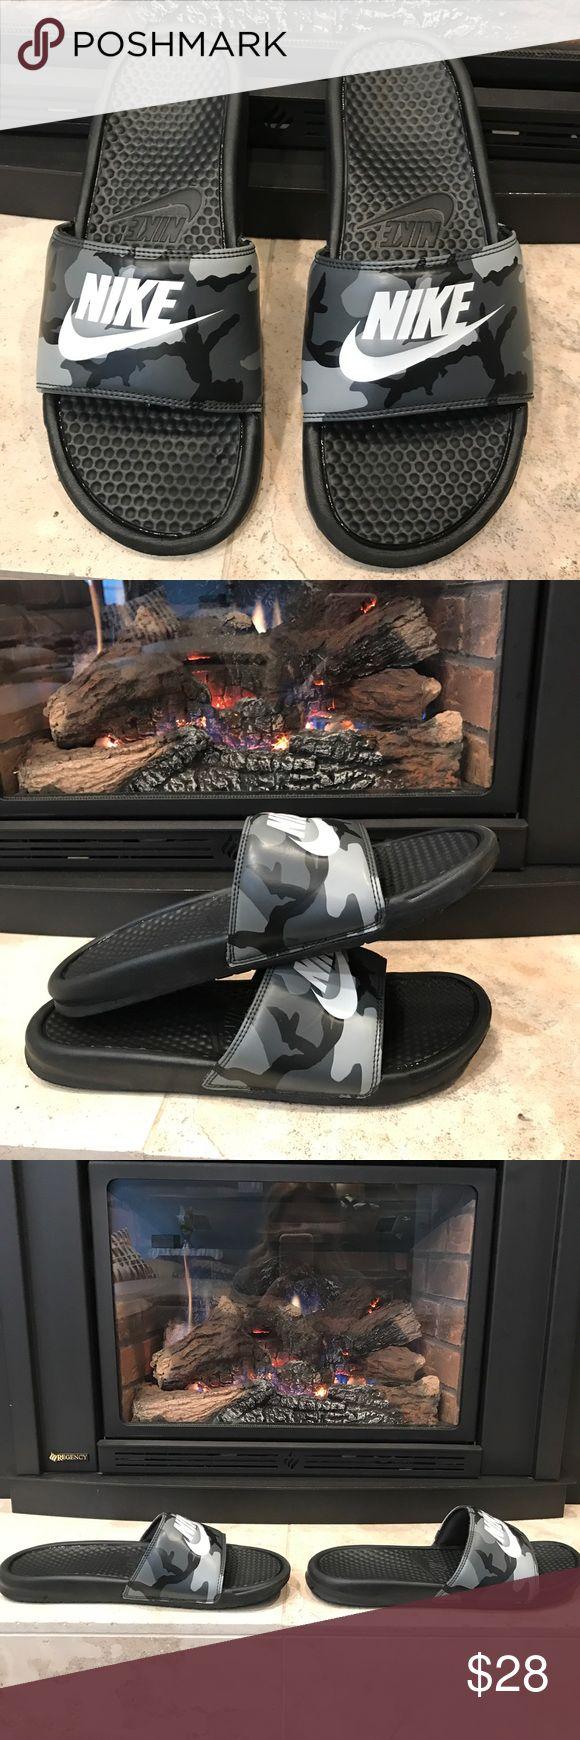 Nike Slides Men's Camo Nike benassi Camo Print.. barely worn⭐️⭐️ Nike Shoes Sandals & Flip-Flops